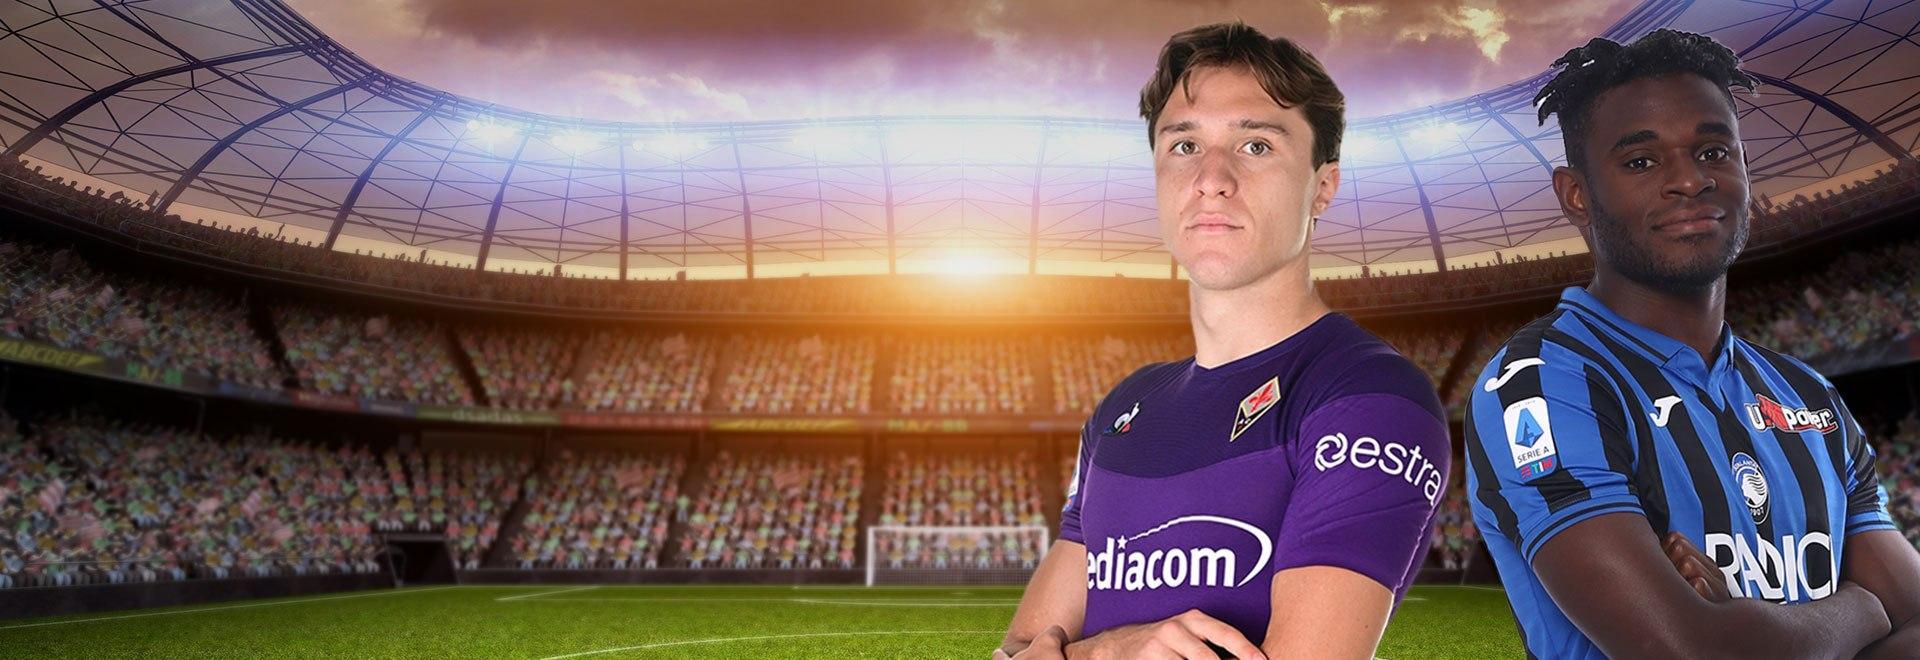 Fiorentina - Atalanta. 23a g.